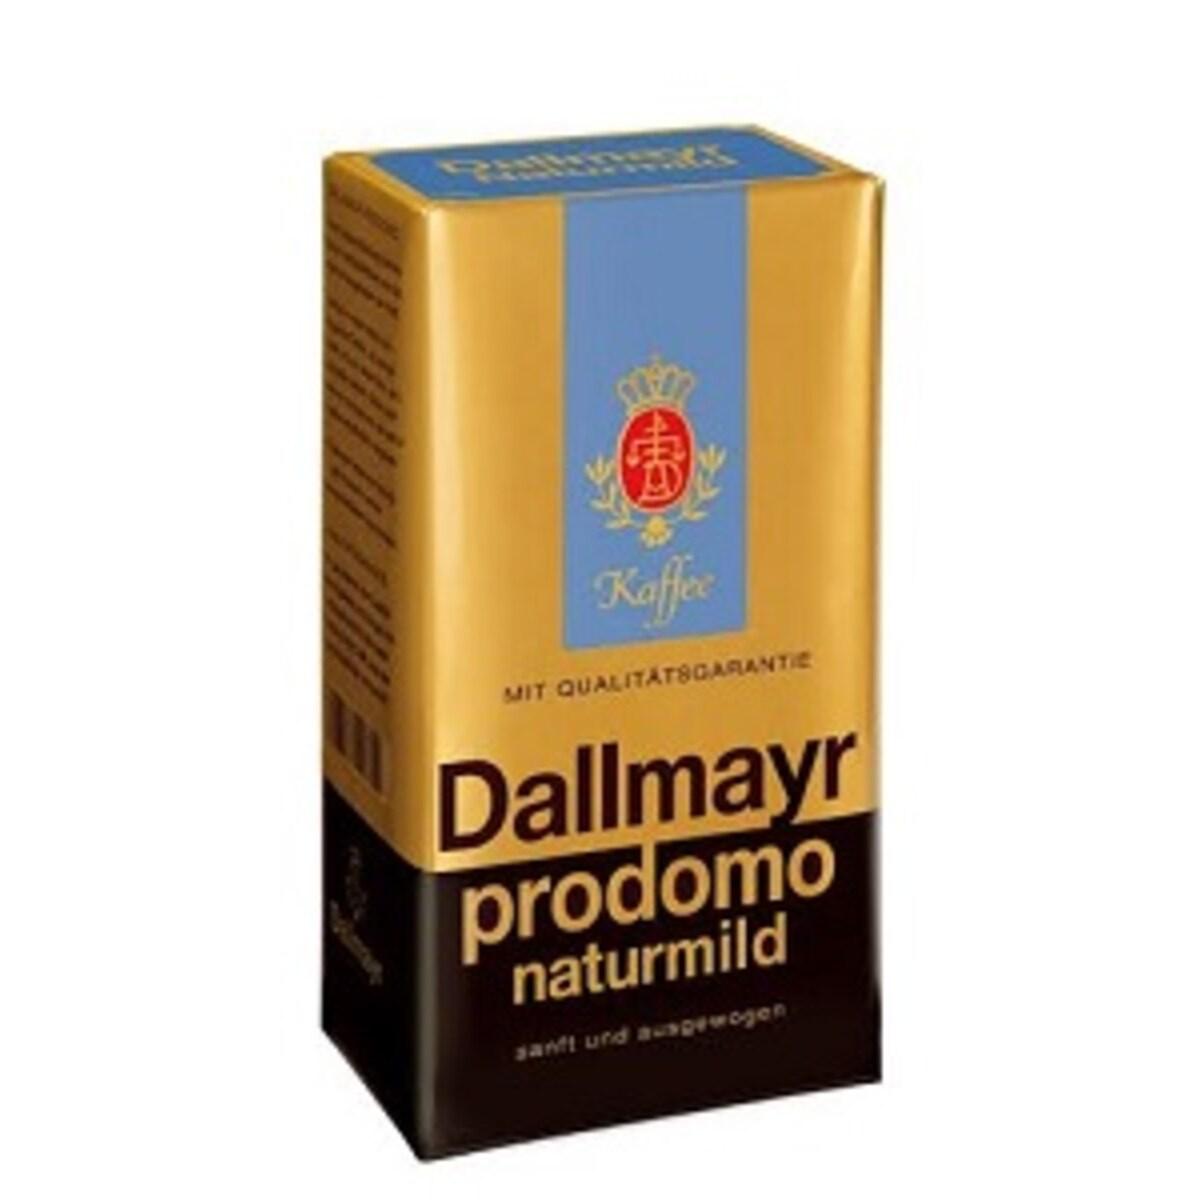 Dallmayr Prodomo Naturmild 500гр мляно кафе